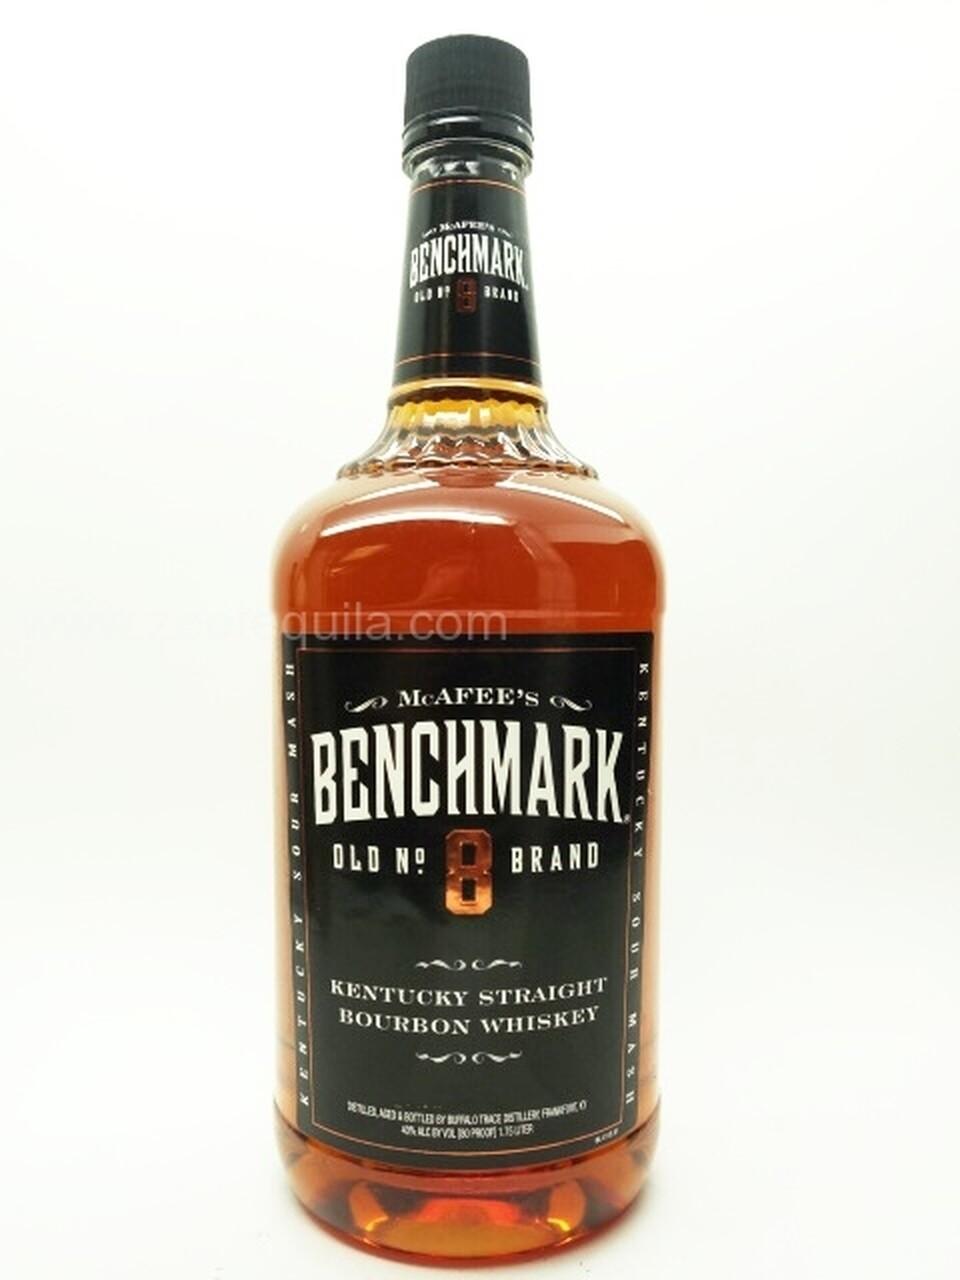 Benchmark 8 1.75